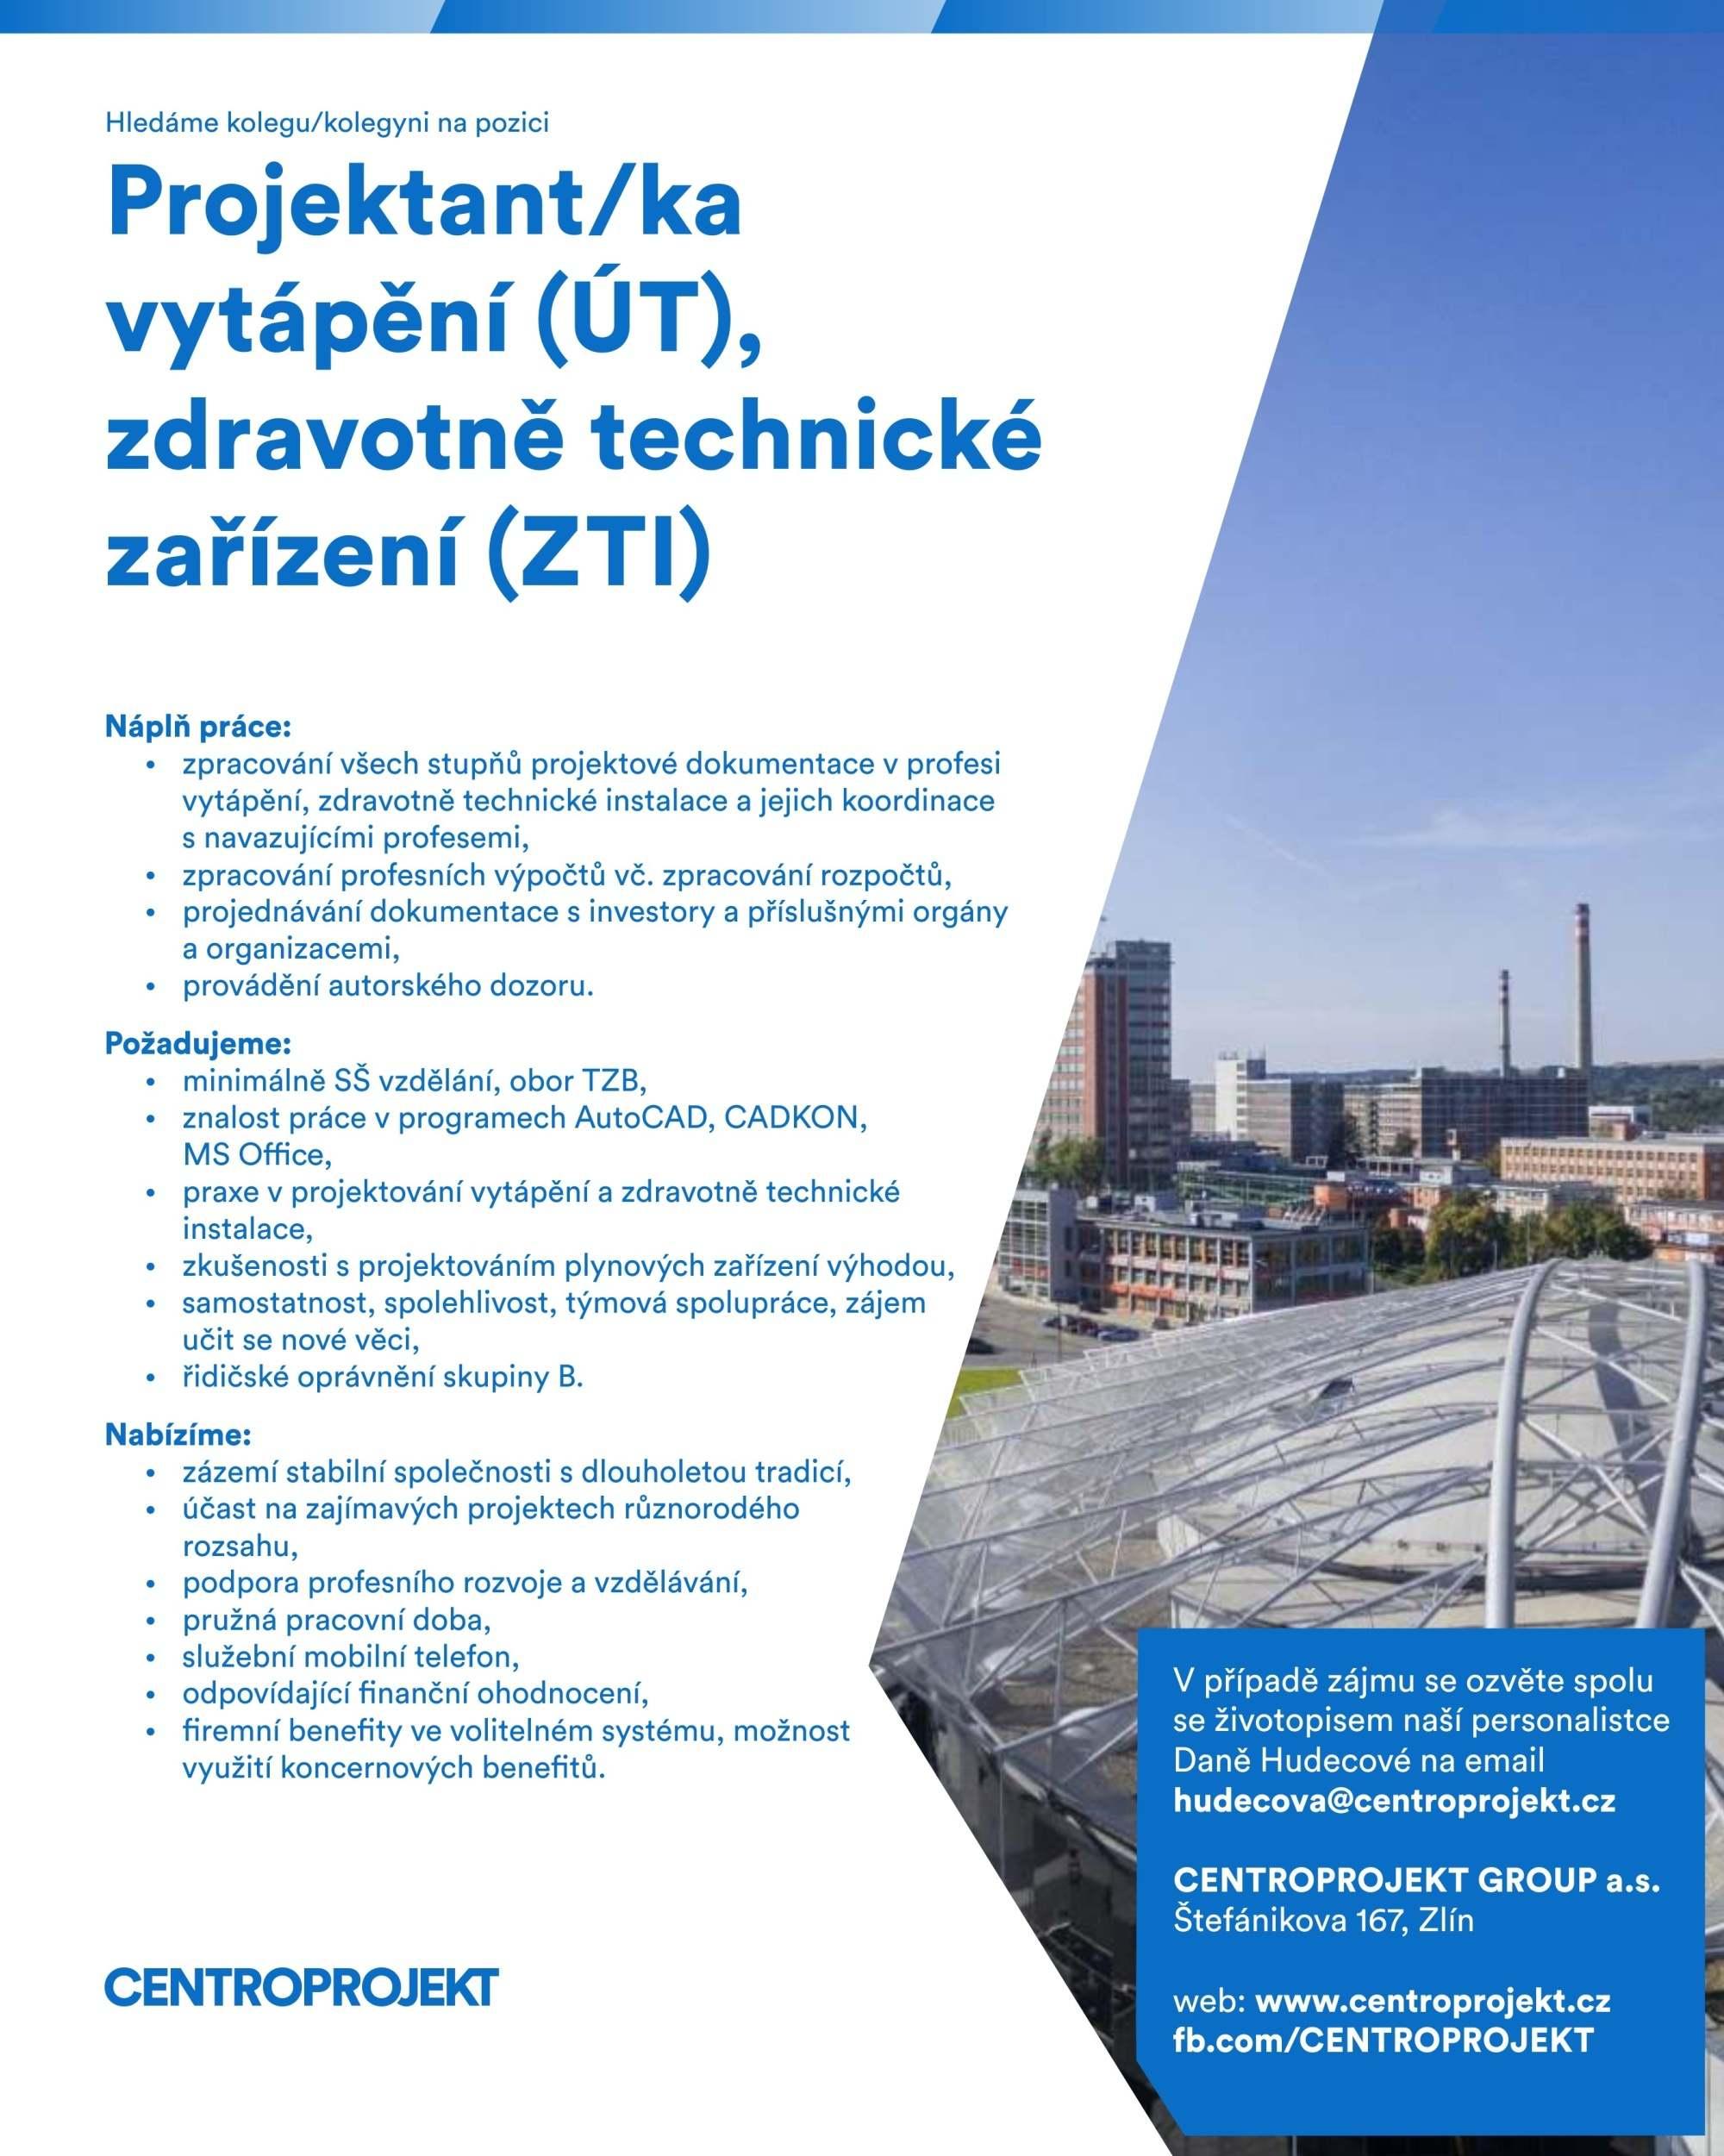 projektant-ut-zti_centroprojekt